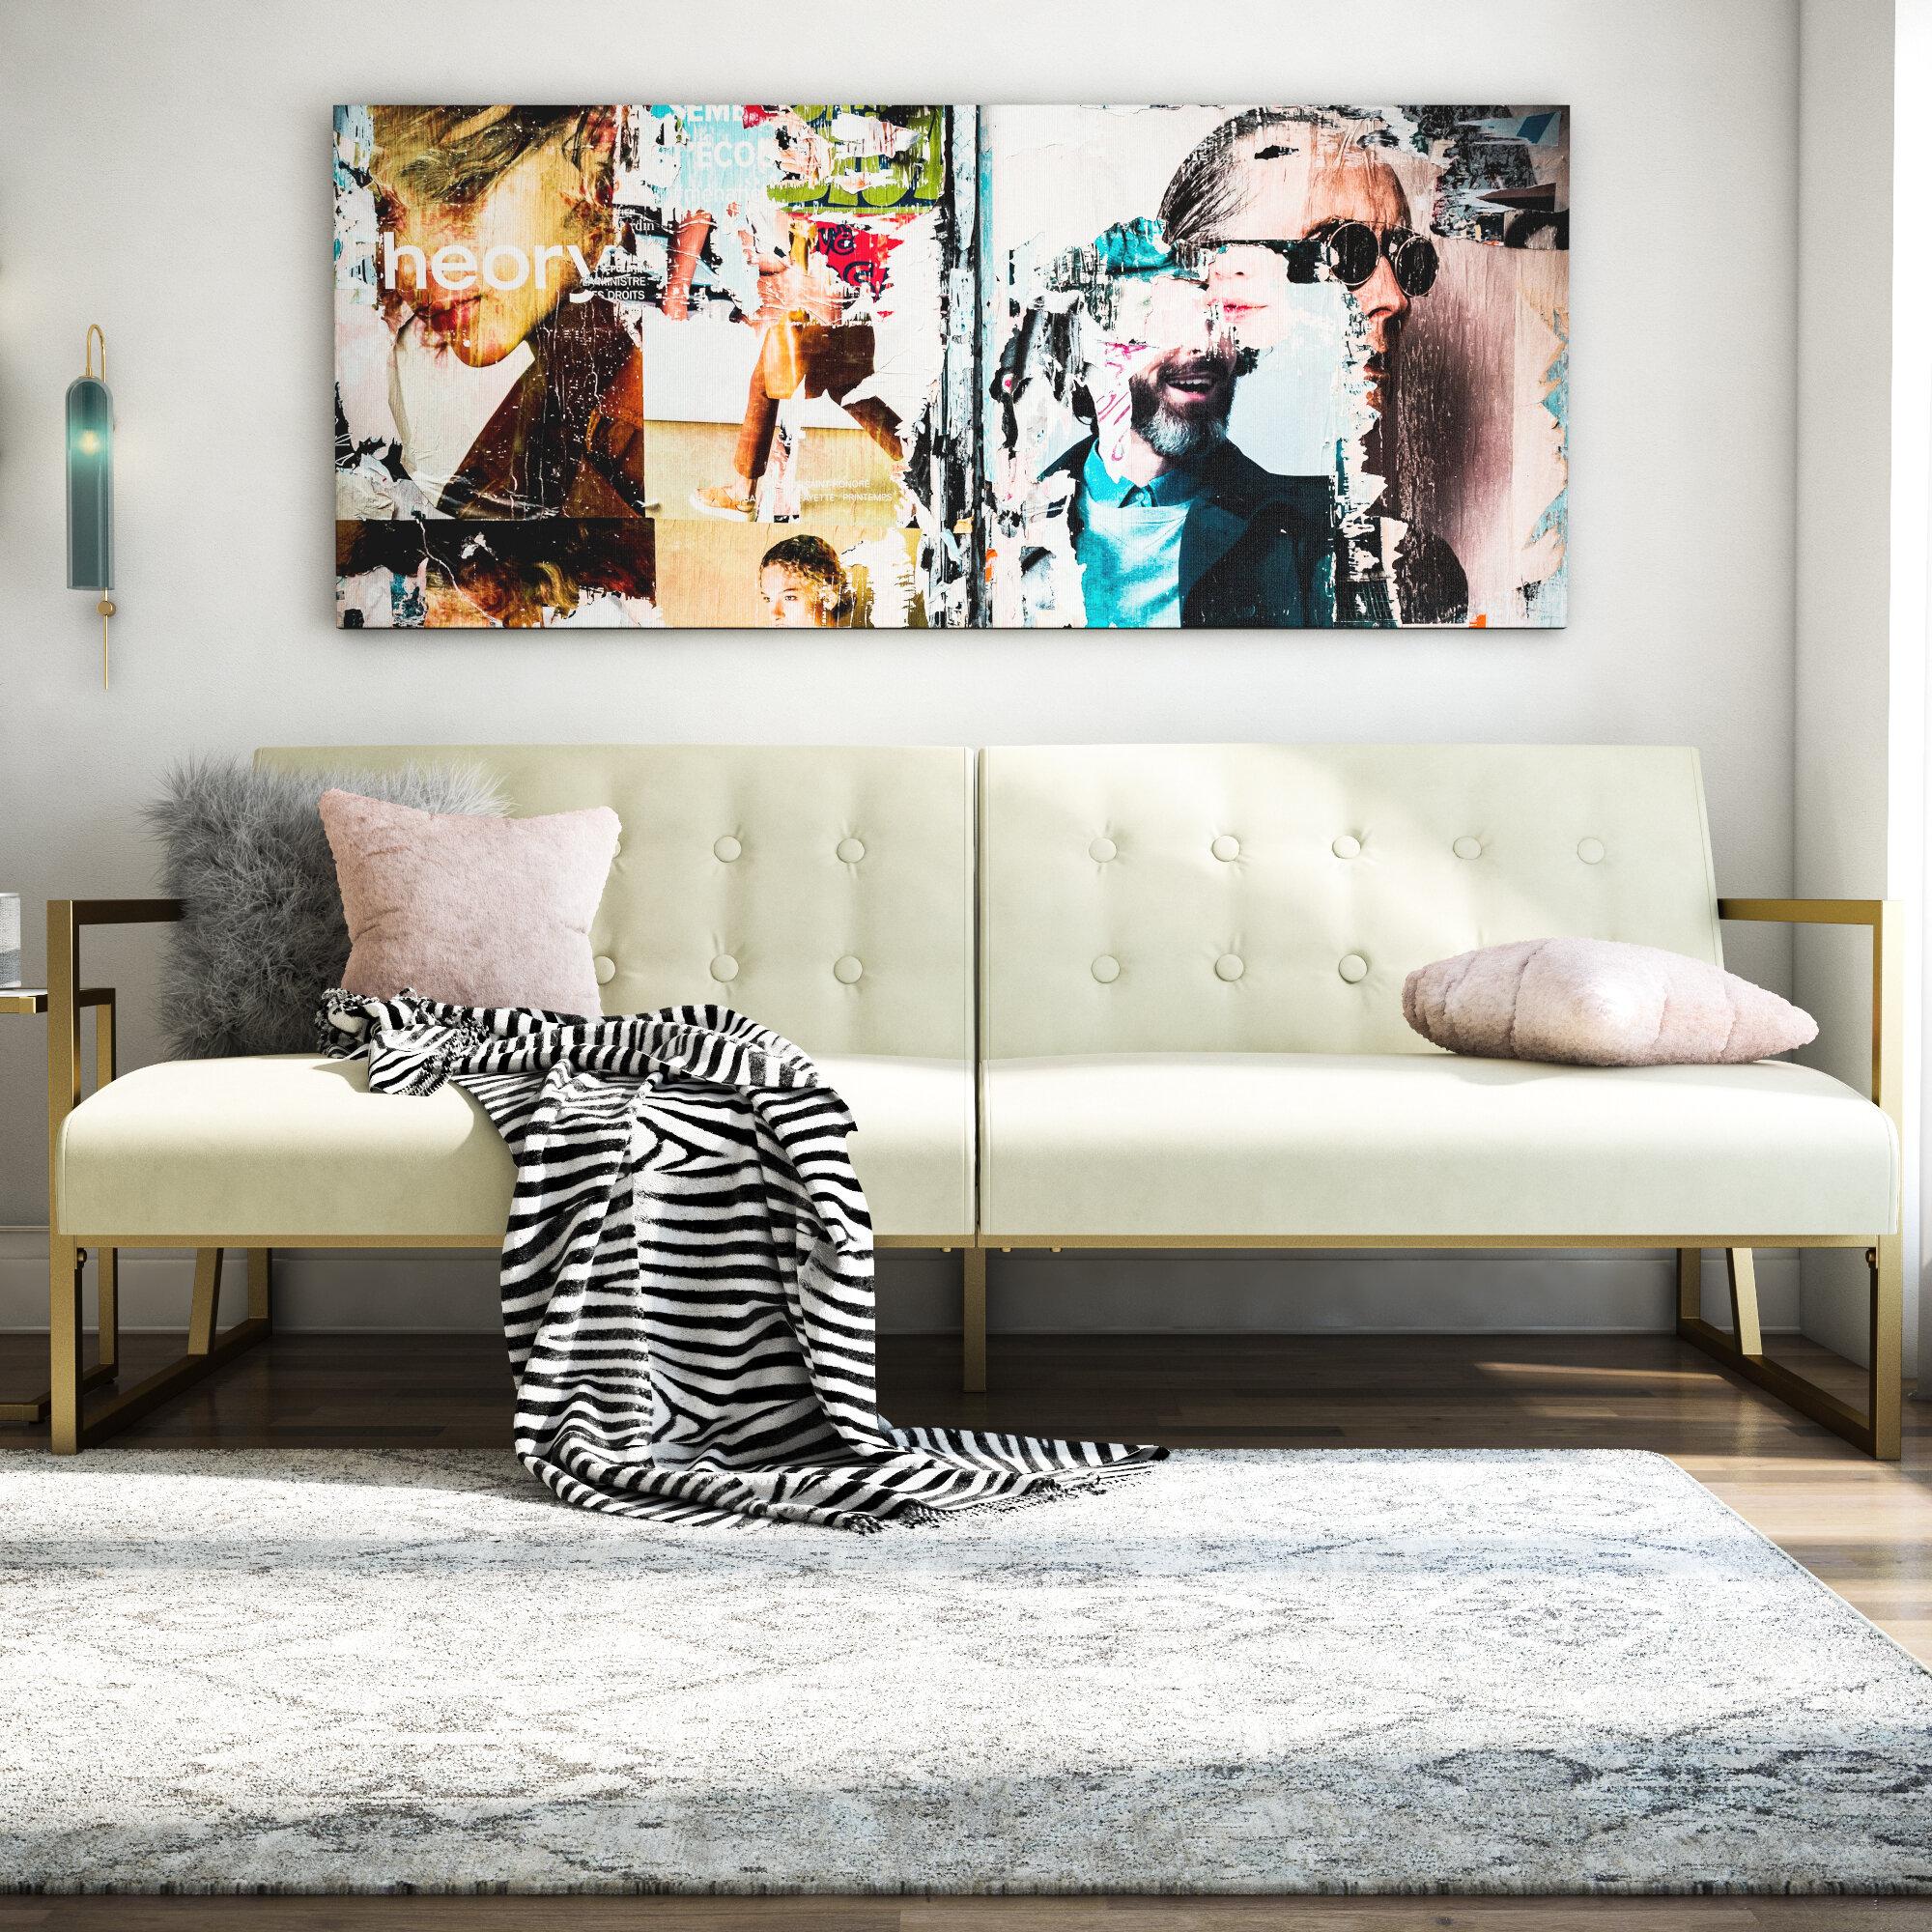 Lexington 3 Seater Clic Clac Sofa Bed